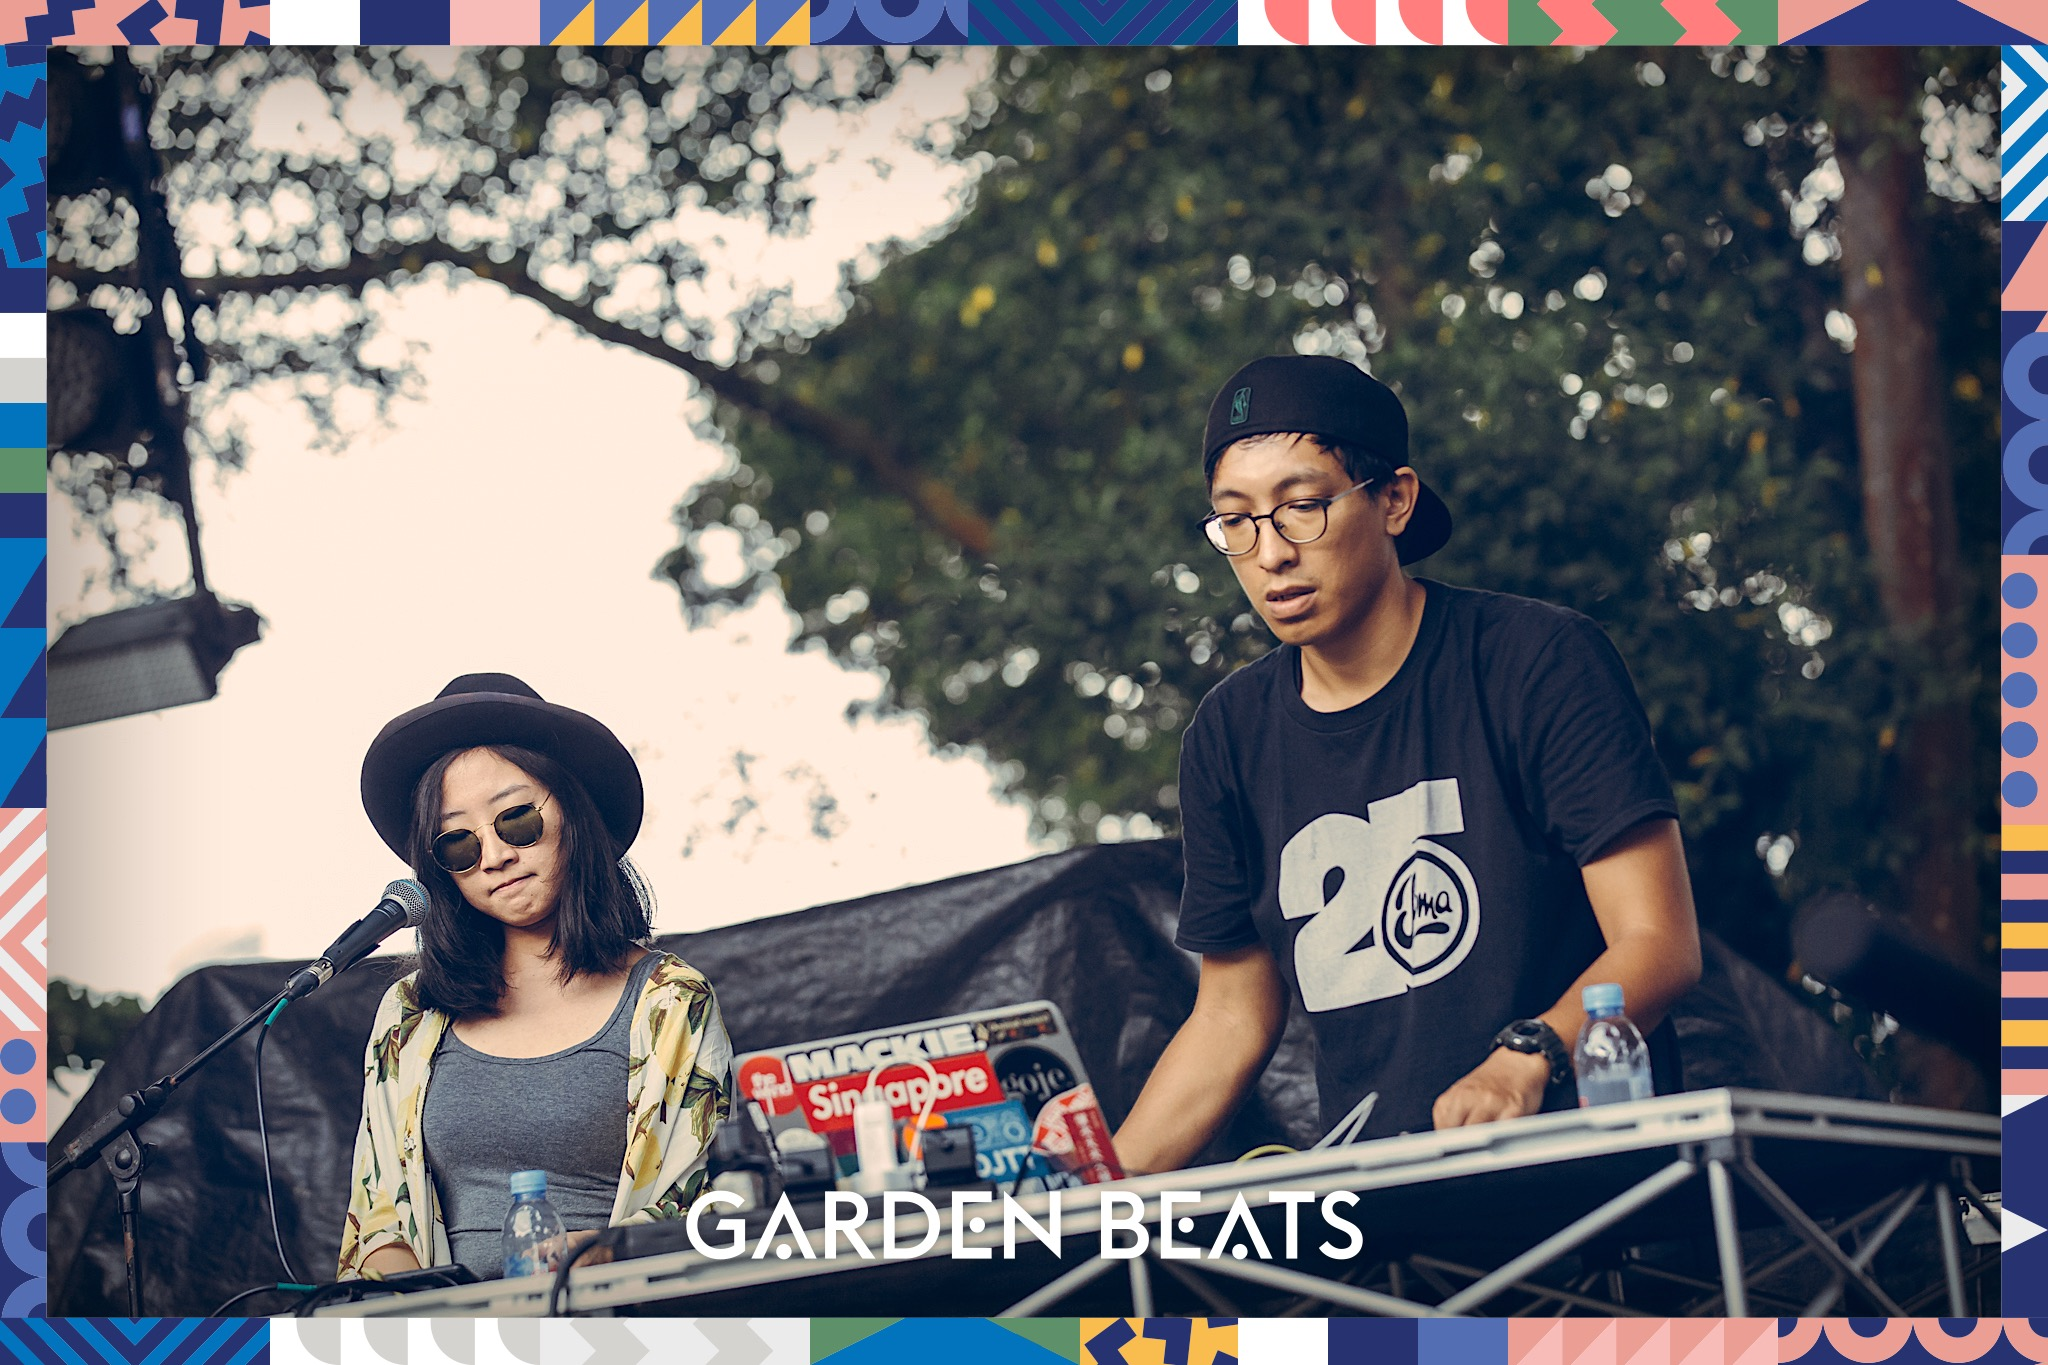 03032018_GardenBeats_Colossal413_Watermarked.jpg